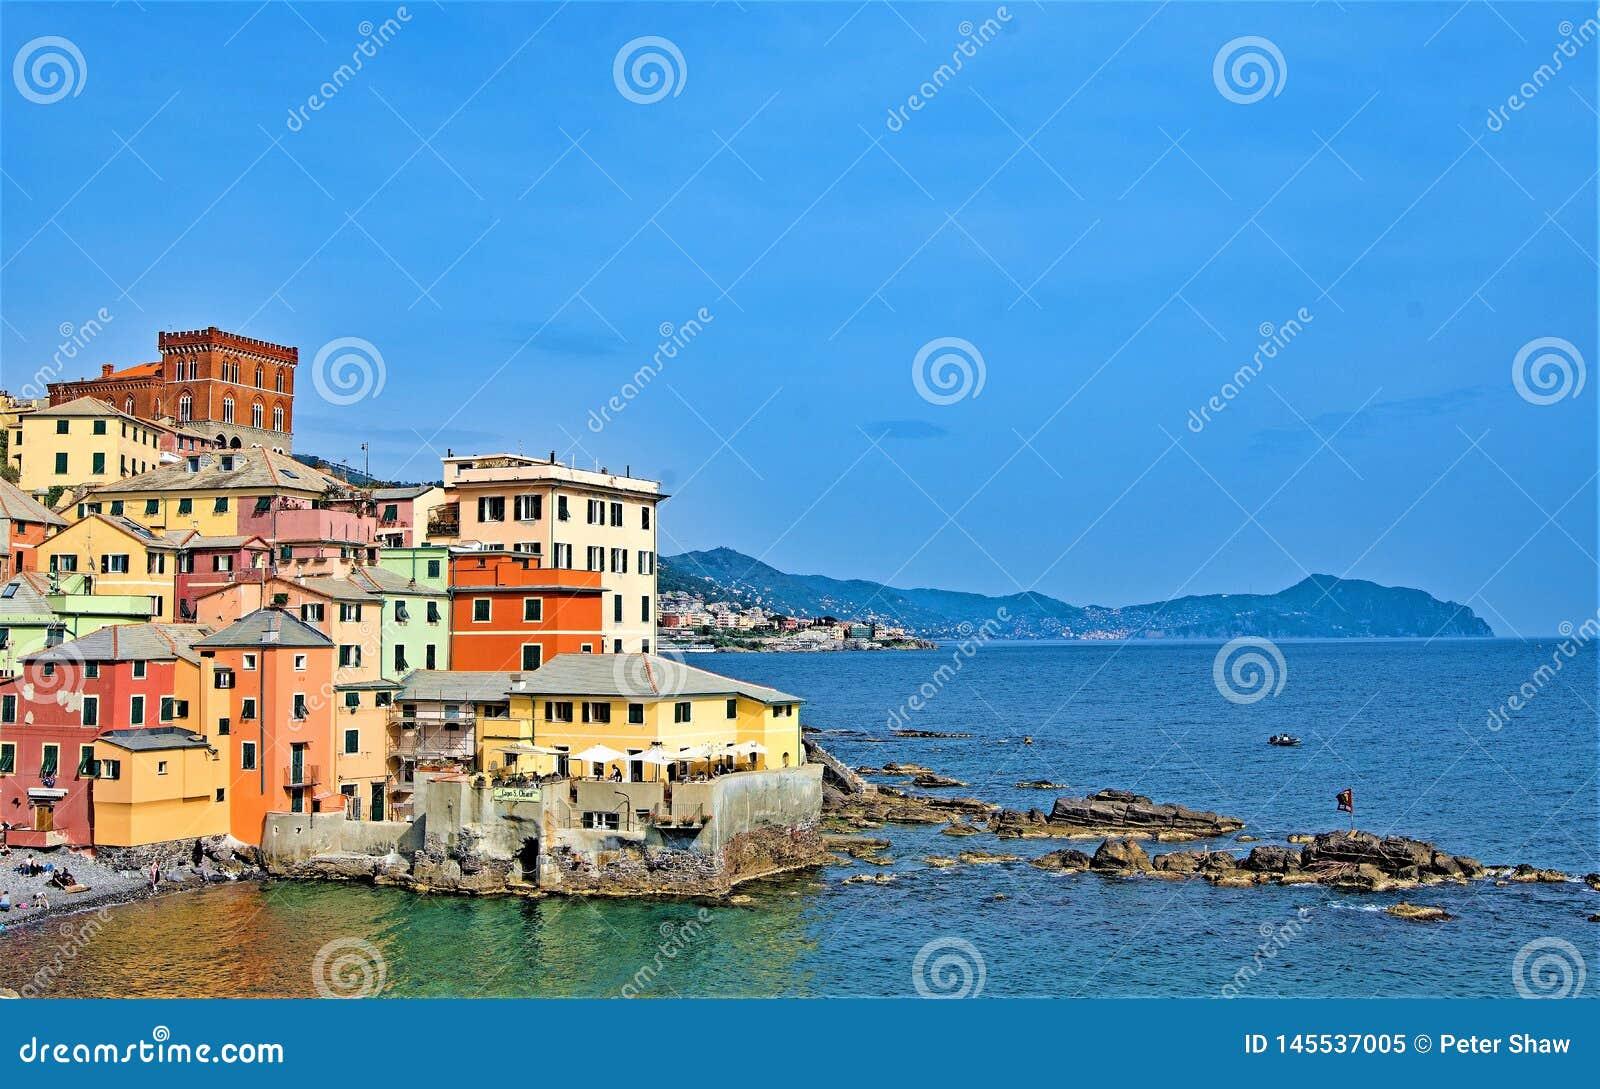 View of Boccadasse and the Ligurian sea 2, under a perfect blue sky, Genoa, Liguria, Italy 2019.